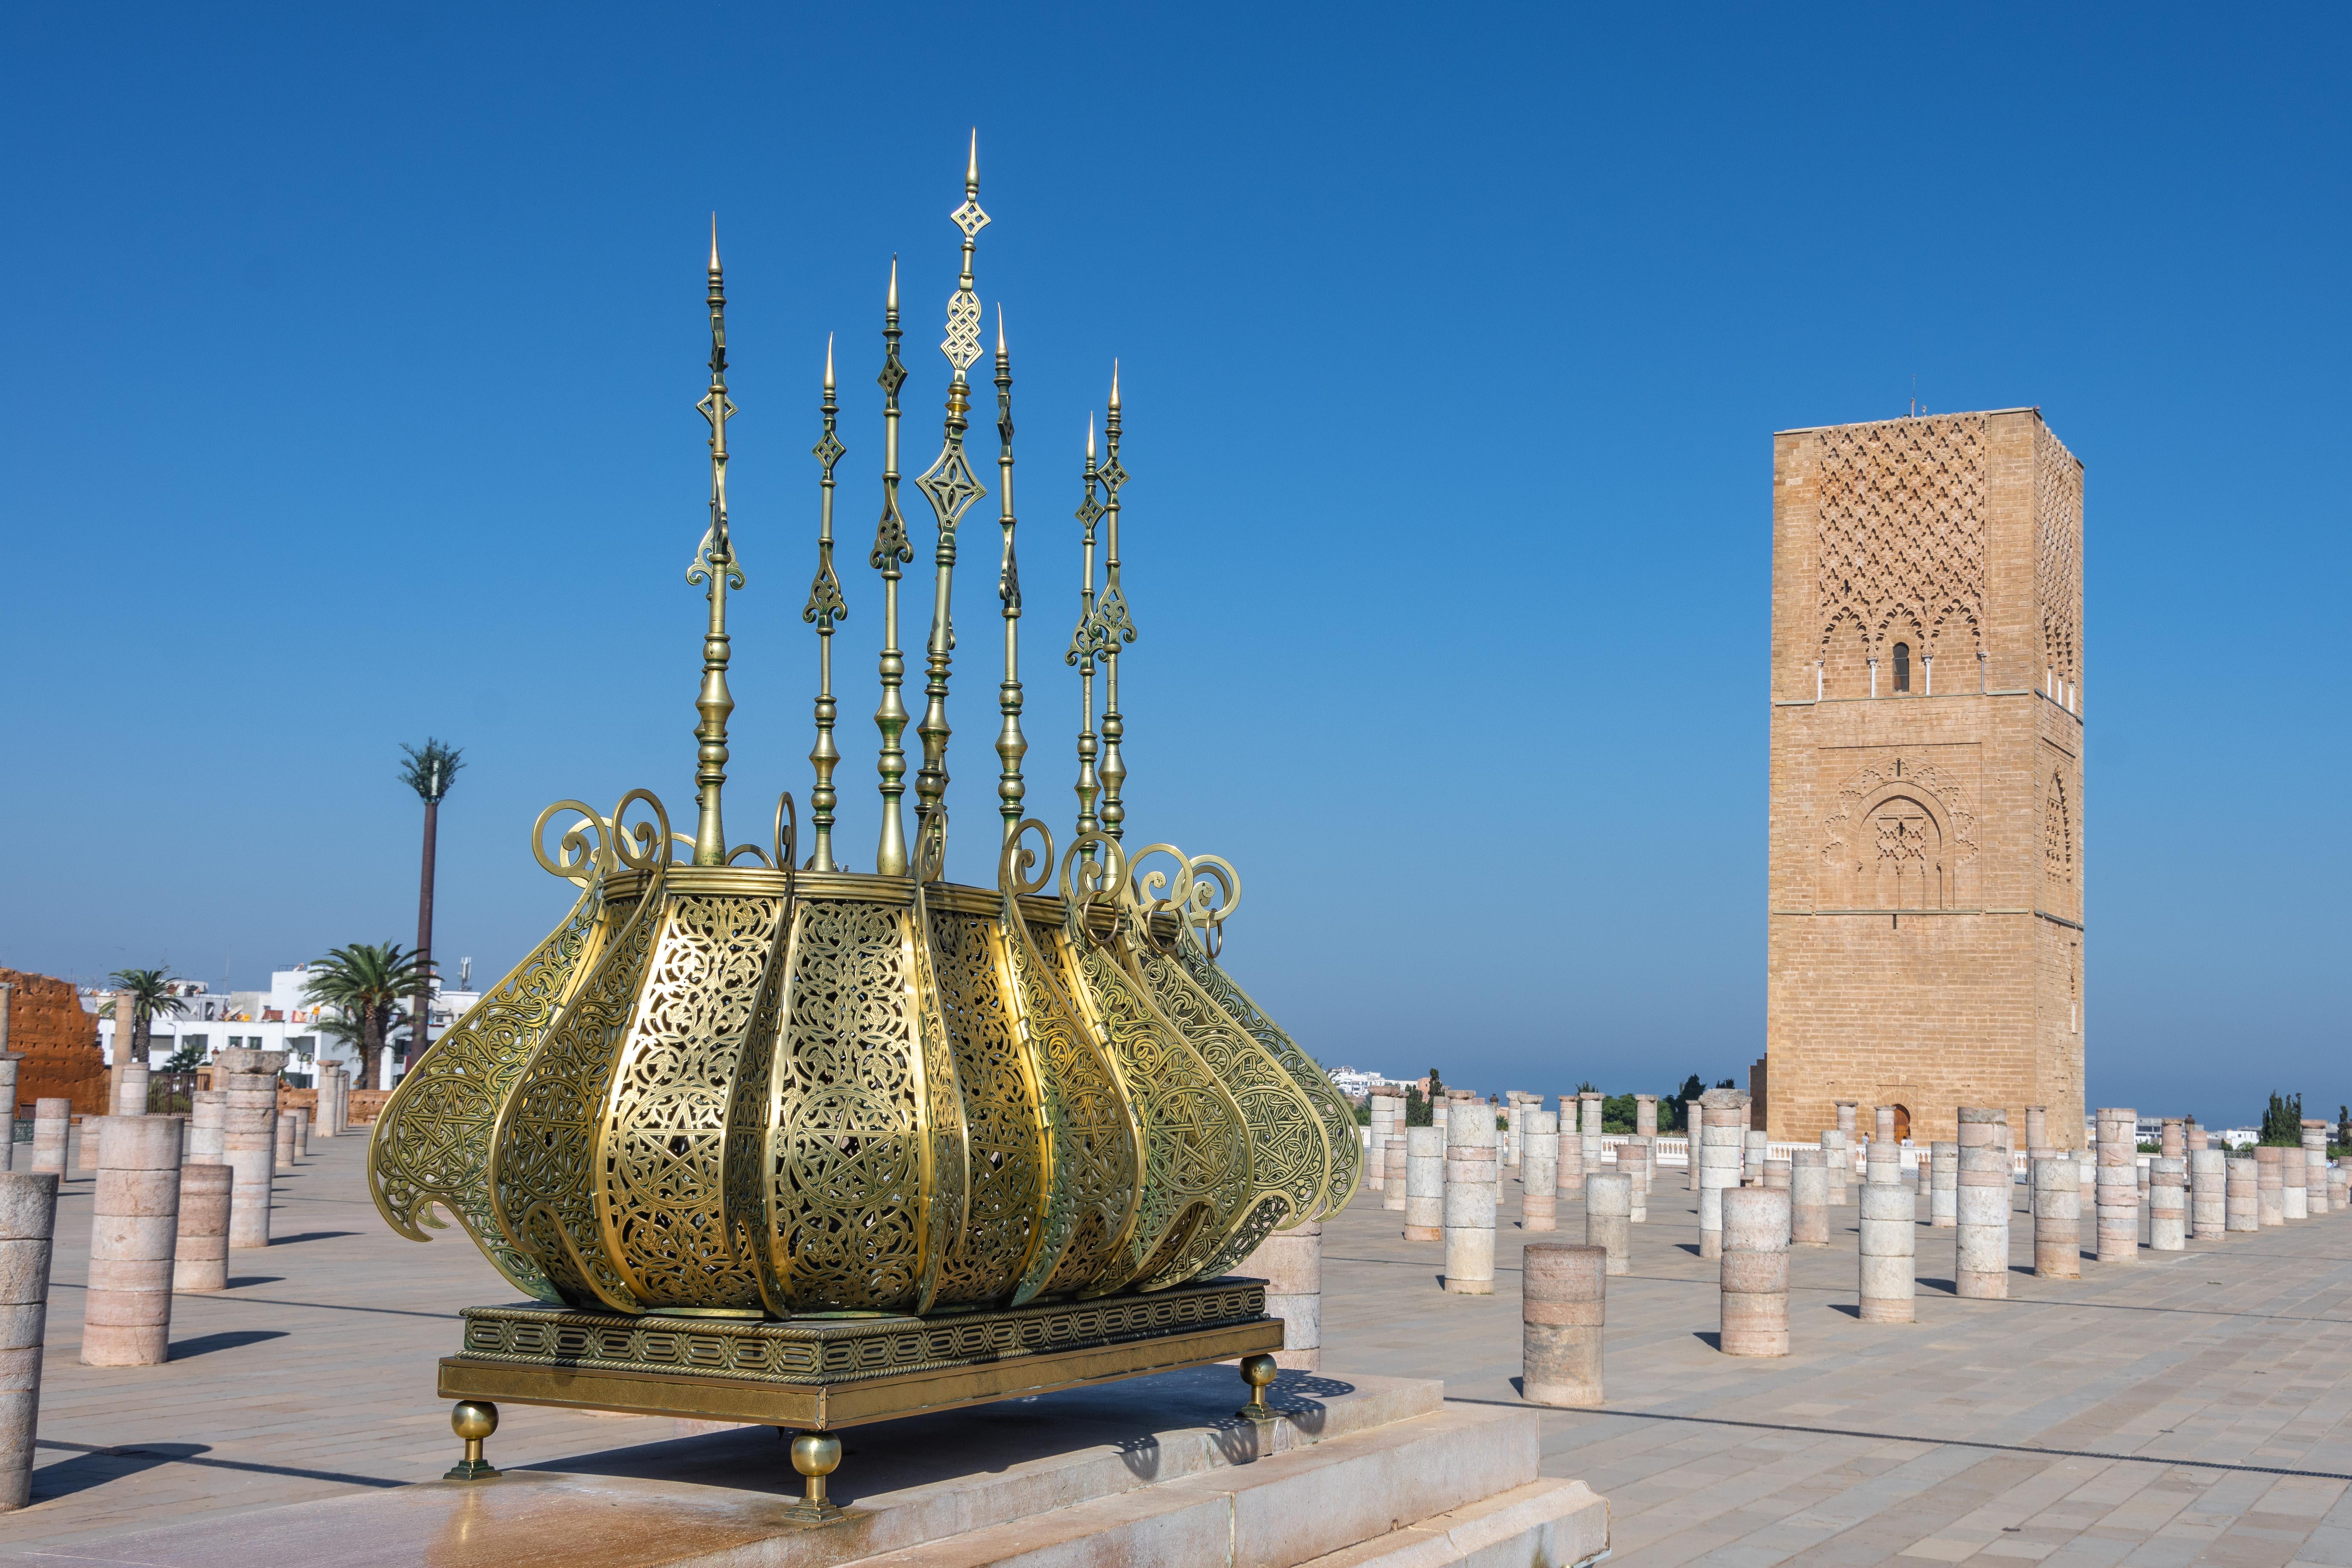 20181002_Marokko_031